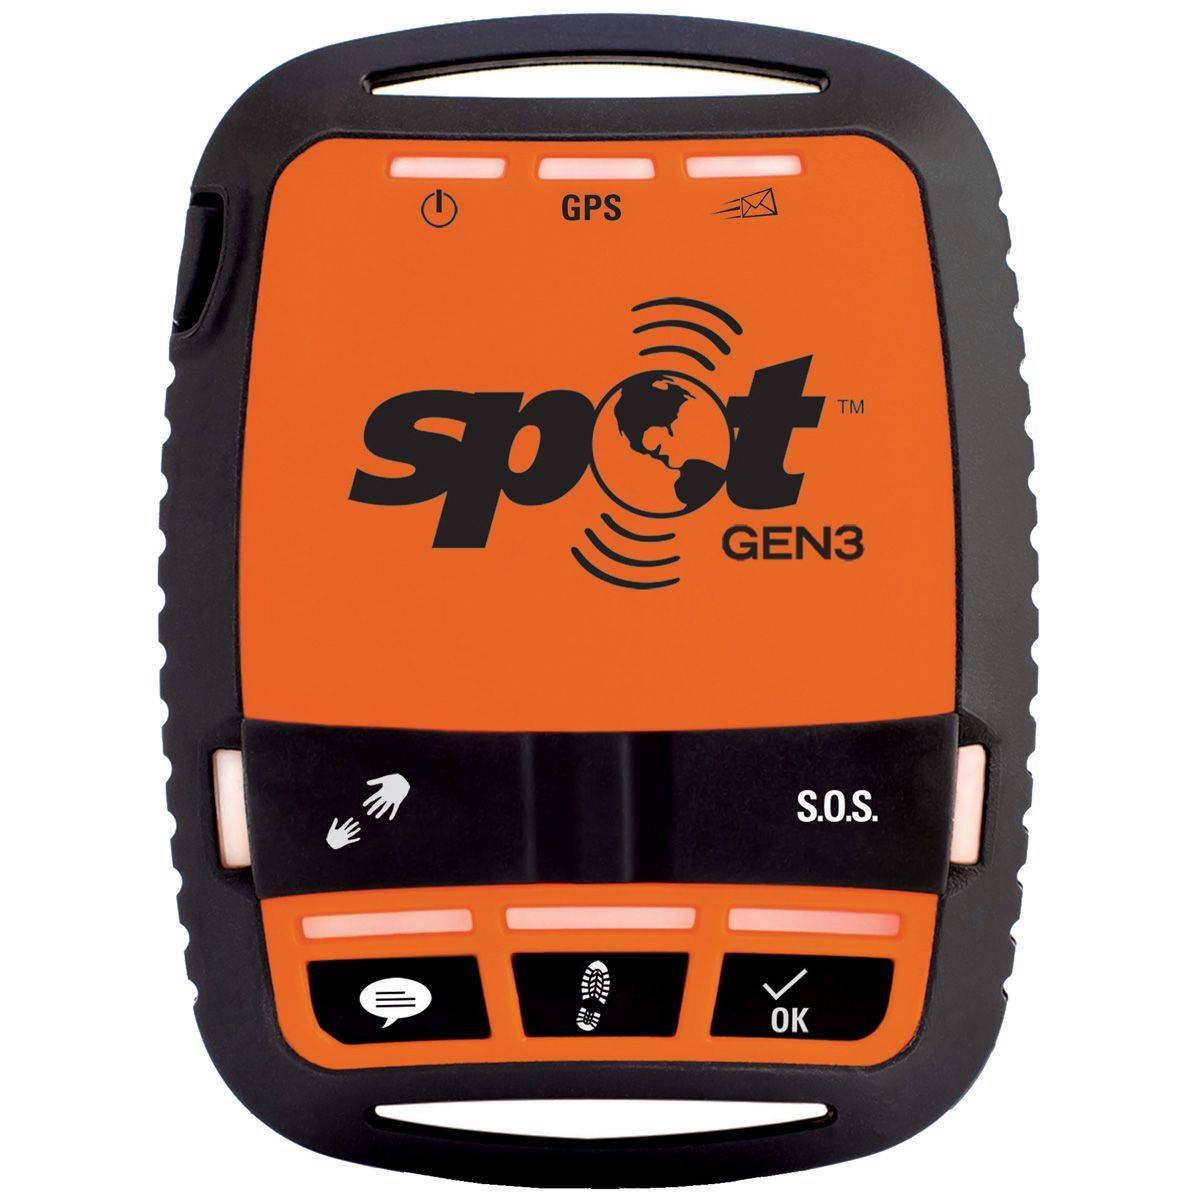 Spot Gen3 Satelliten GPS Messenger